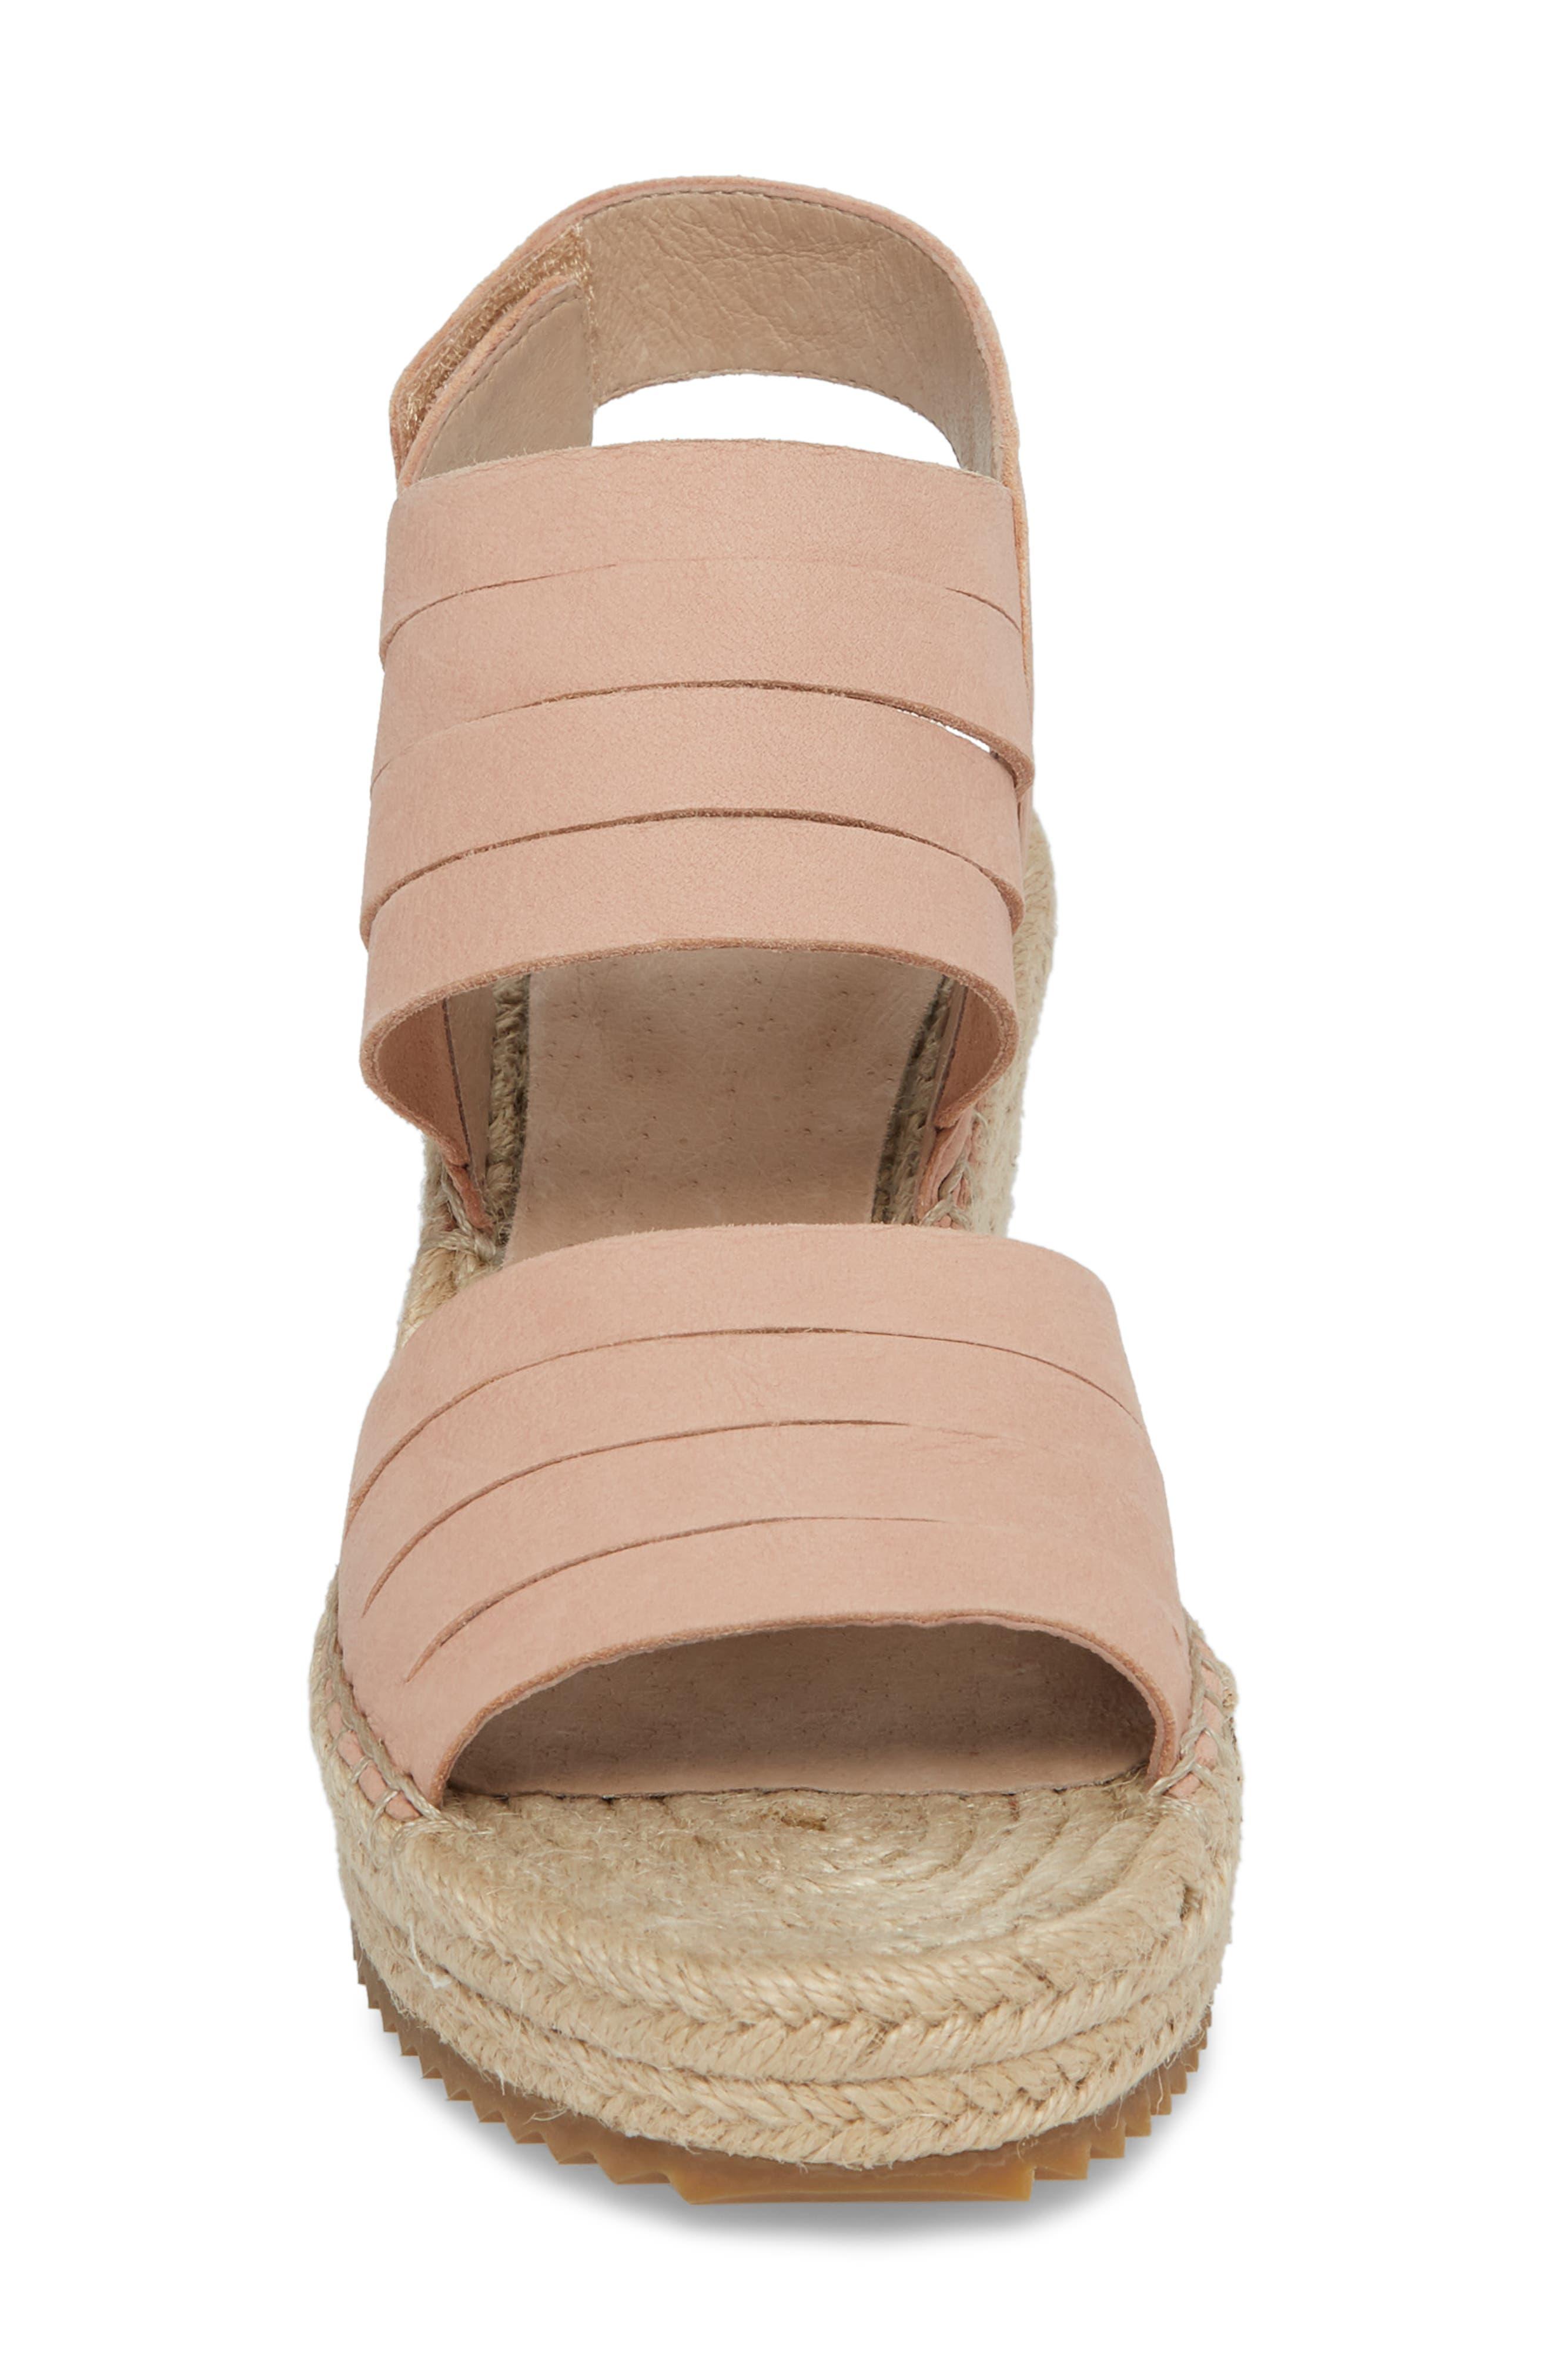 Largo Espadrille Wedge Sandal,                             Alternate thumbnail 4, color,                             Toffee Cream Nubuck